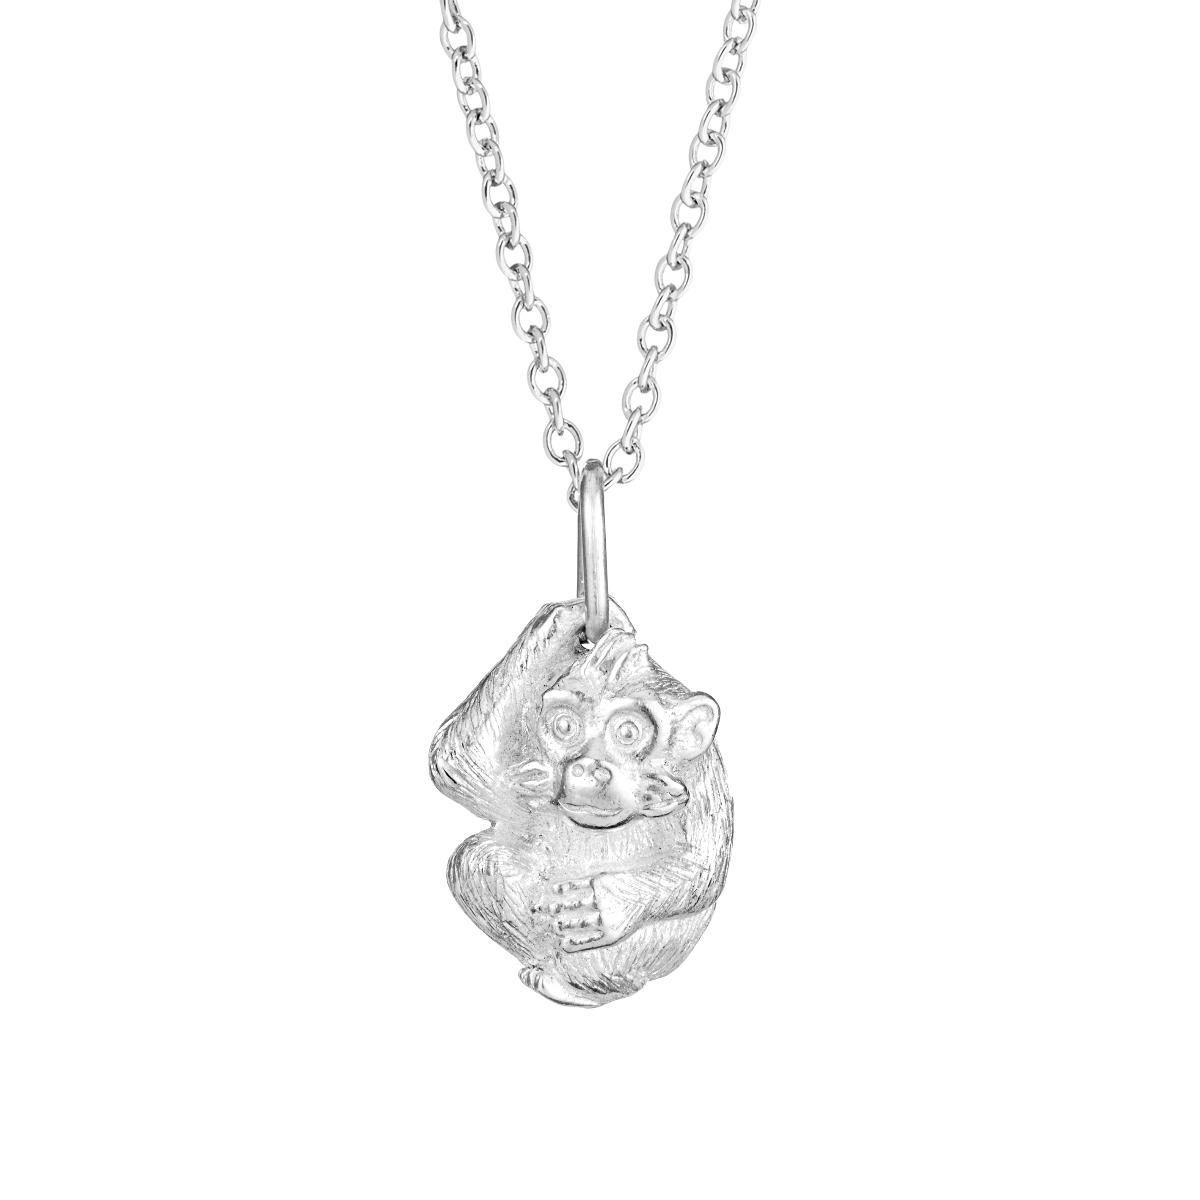 Chinese zodiac pendant necklace (monkey)